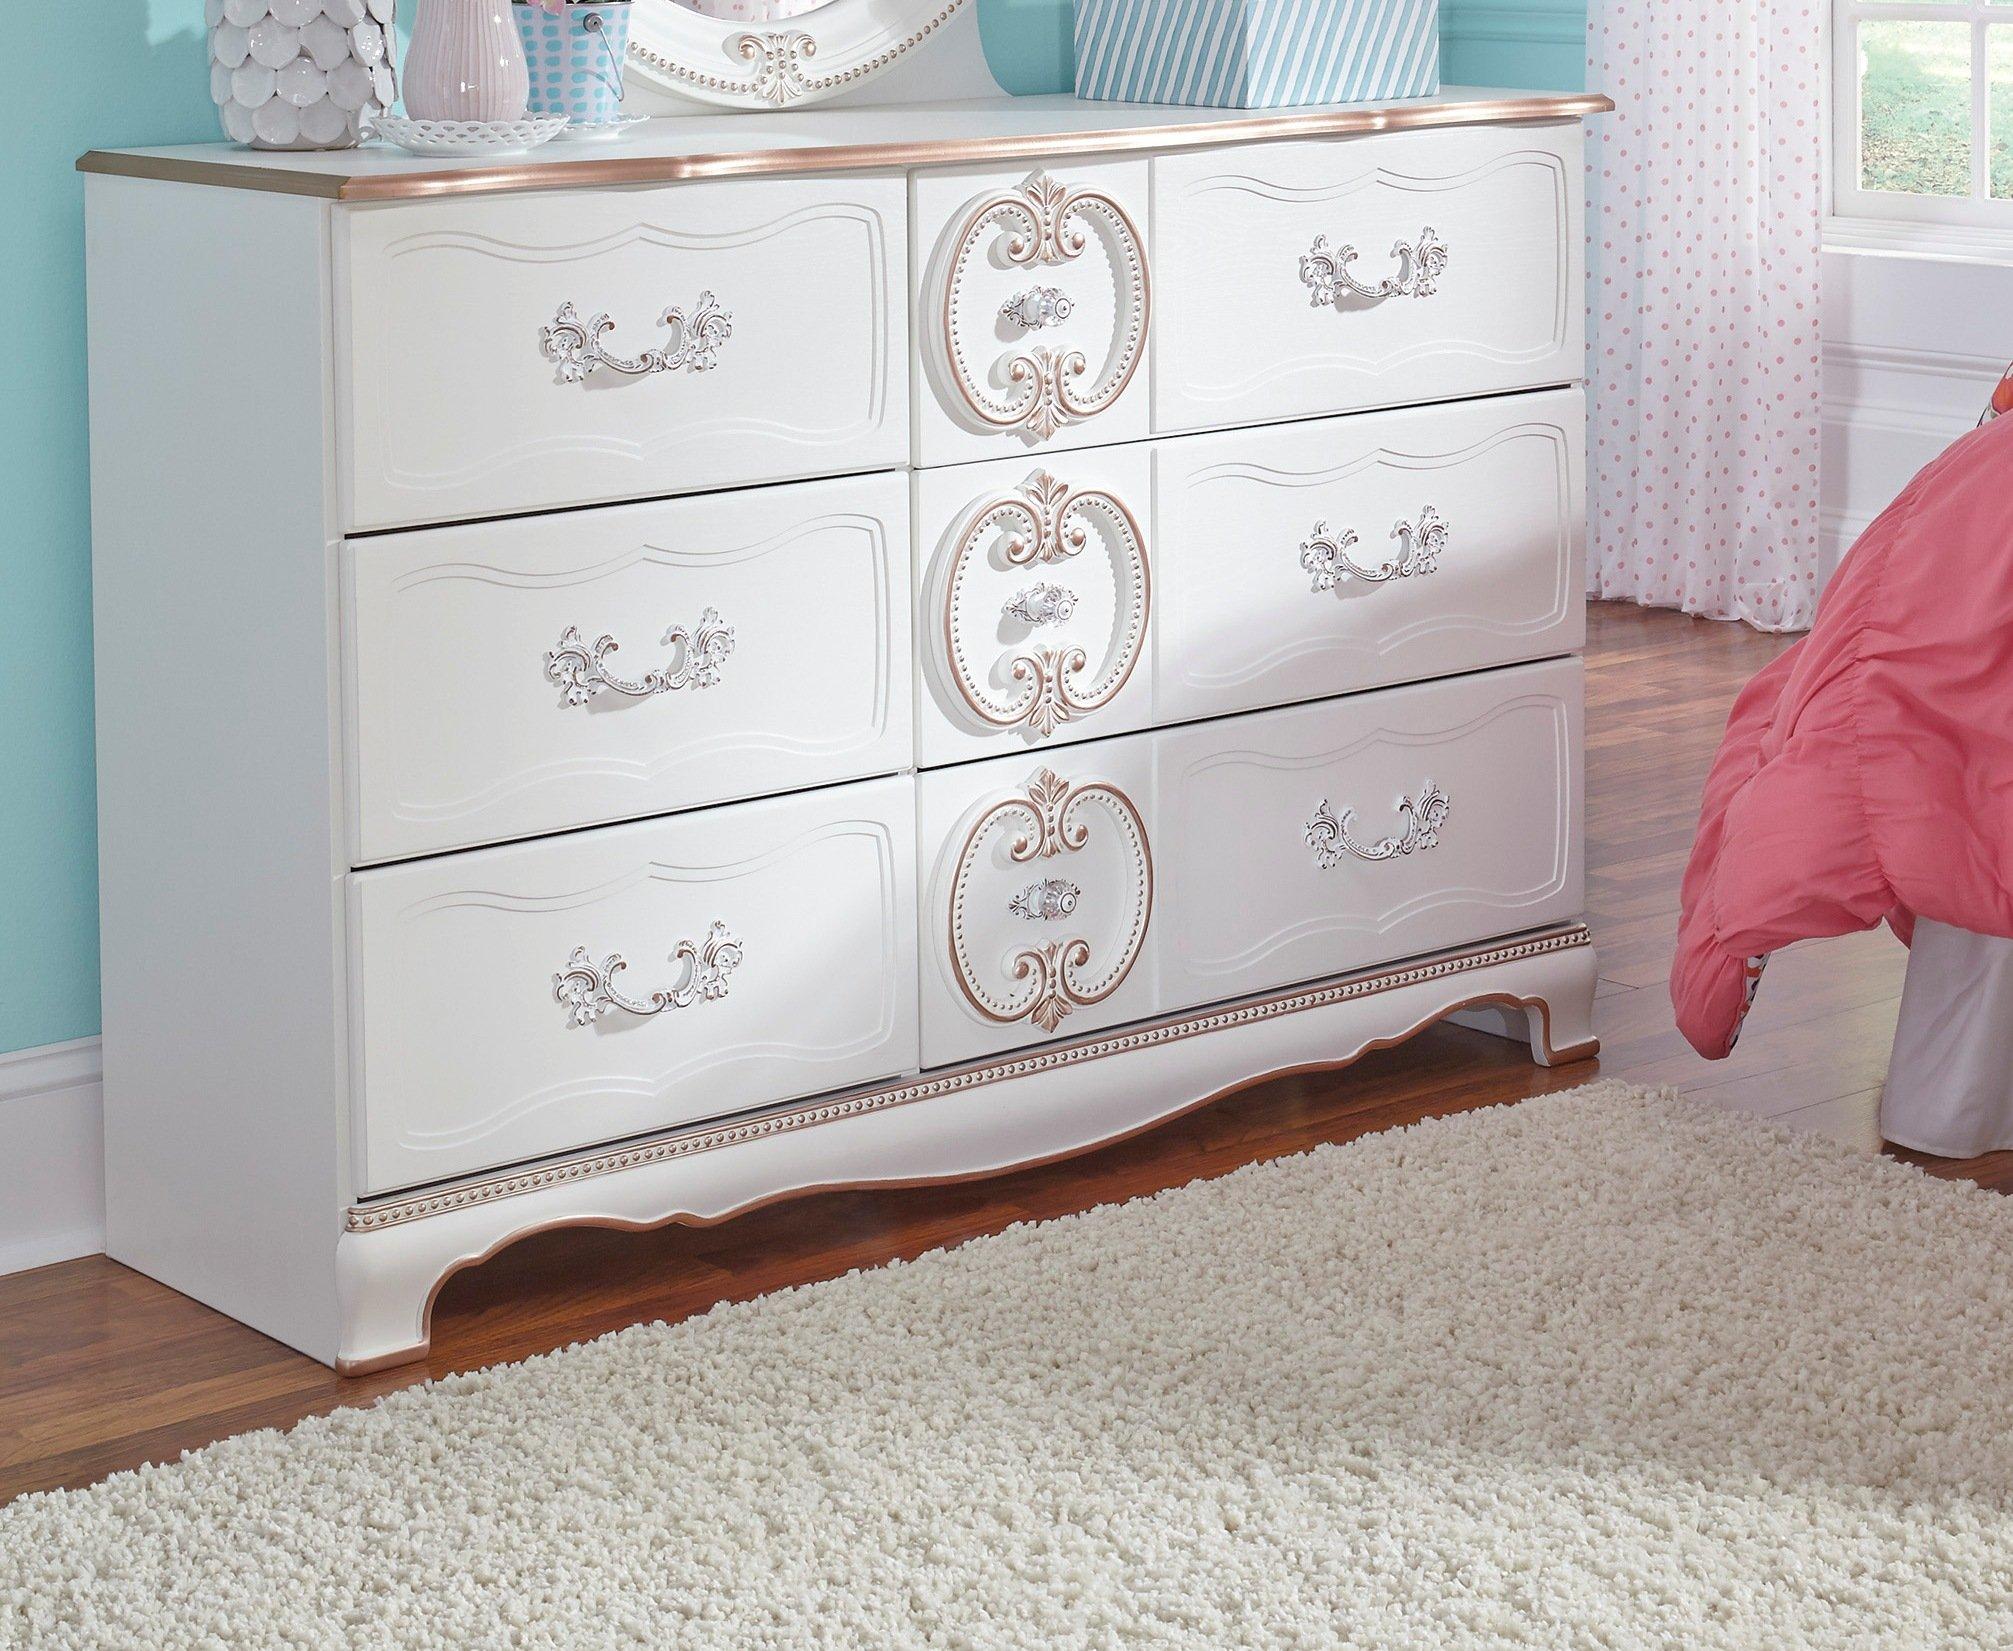 Ashley Furniture Signature Design - Korabella Dresser - 6 Drawers -French Inspired Traditional Styling - White